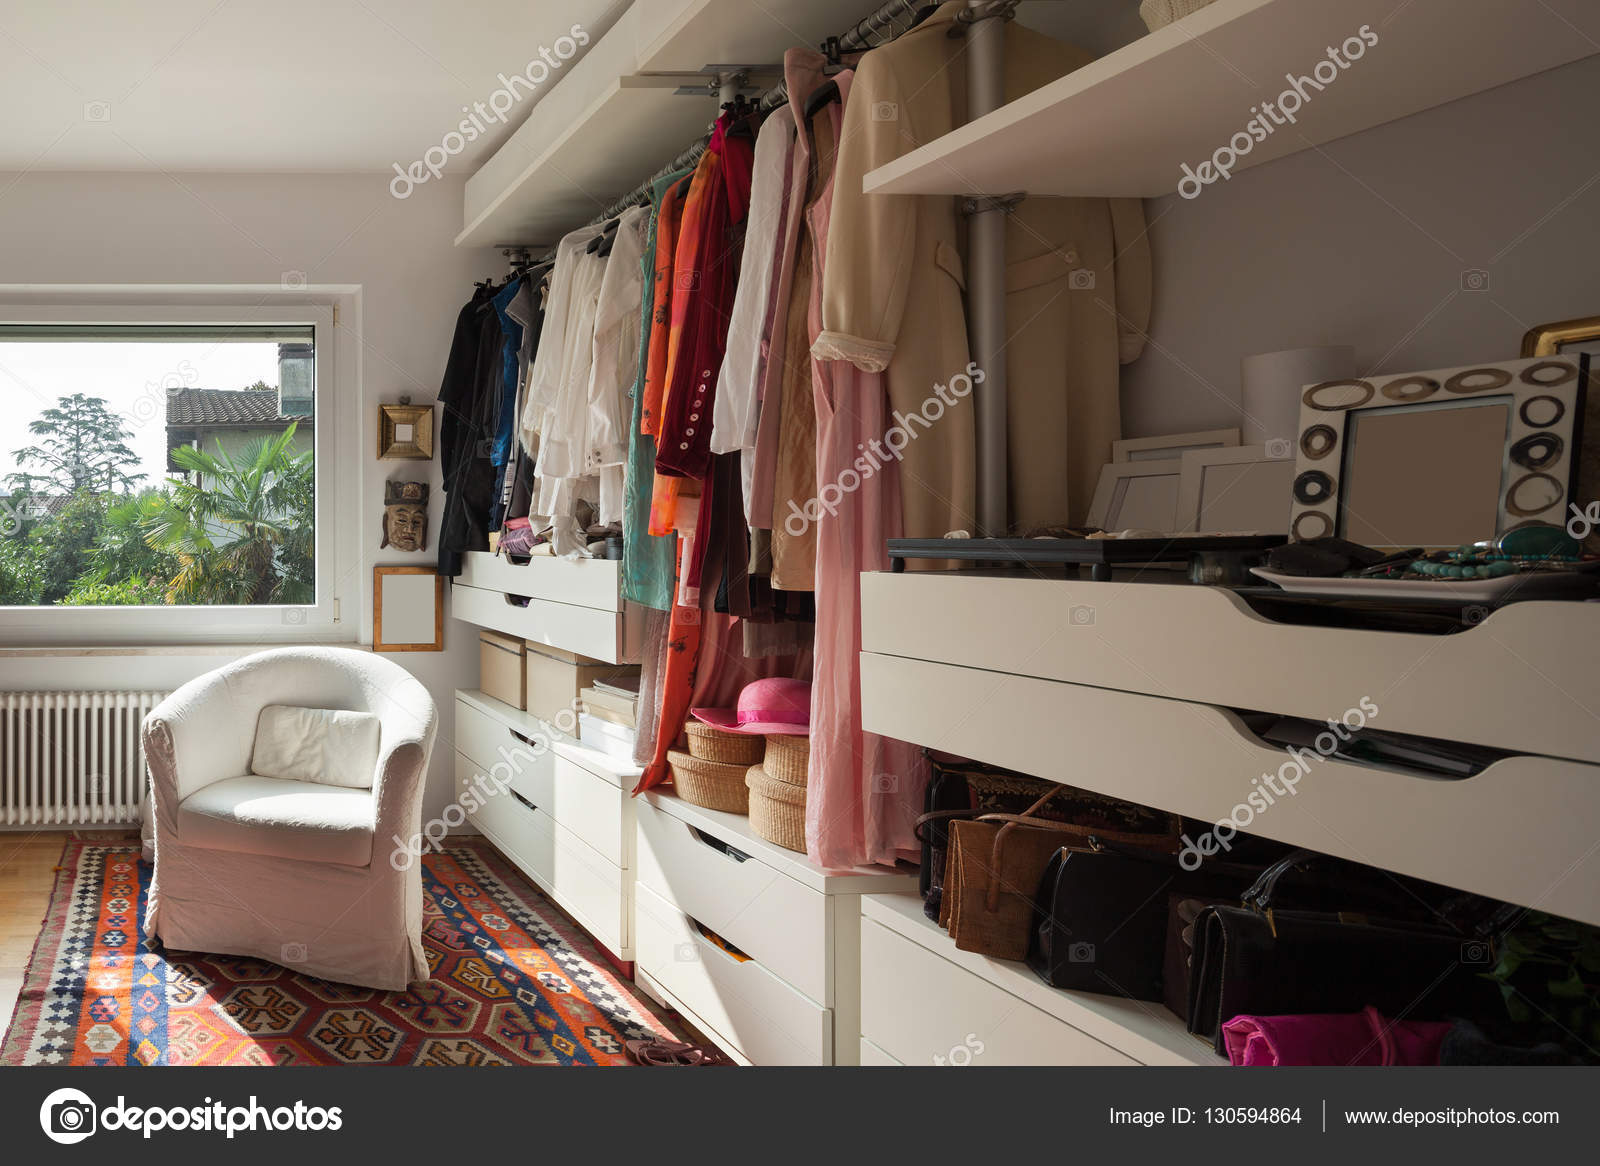 Slaapkamer Met Kledingkast : Kledingkast van een slaapkamer u2014 stockfoto © zveiger #130594864